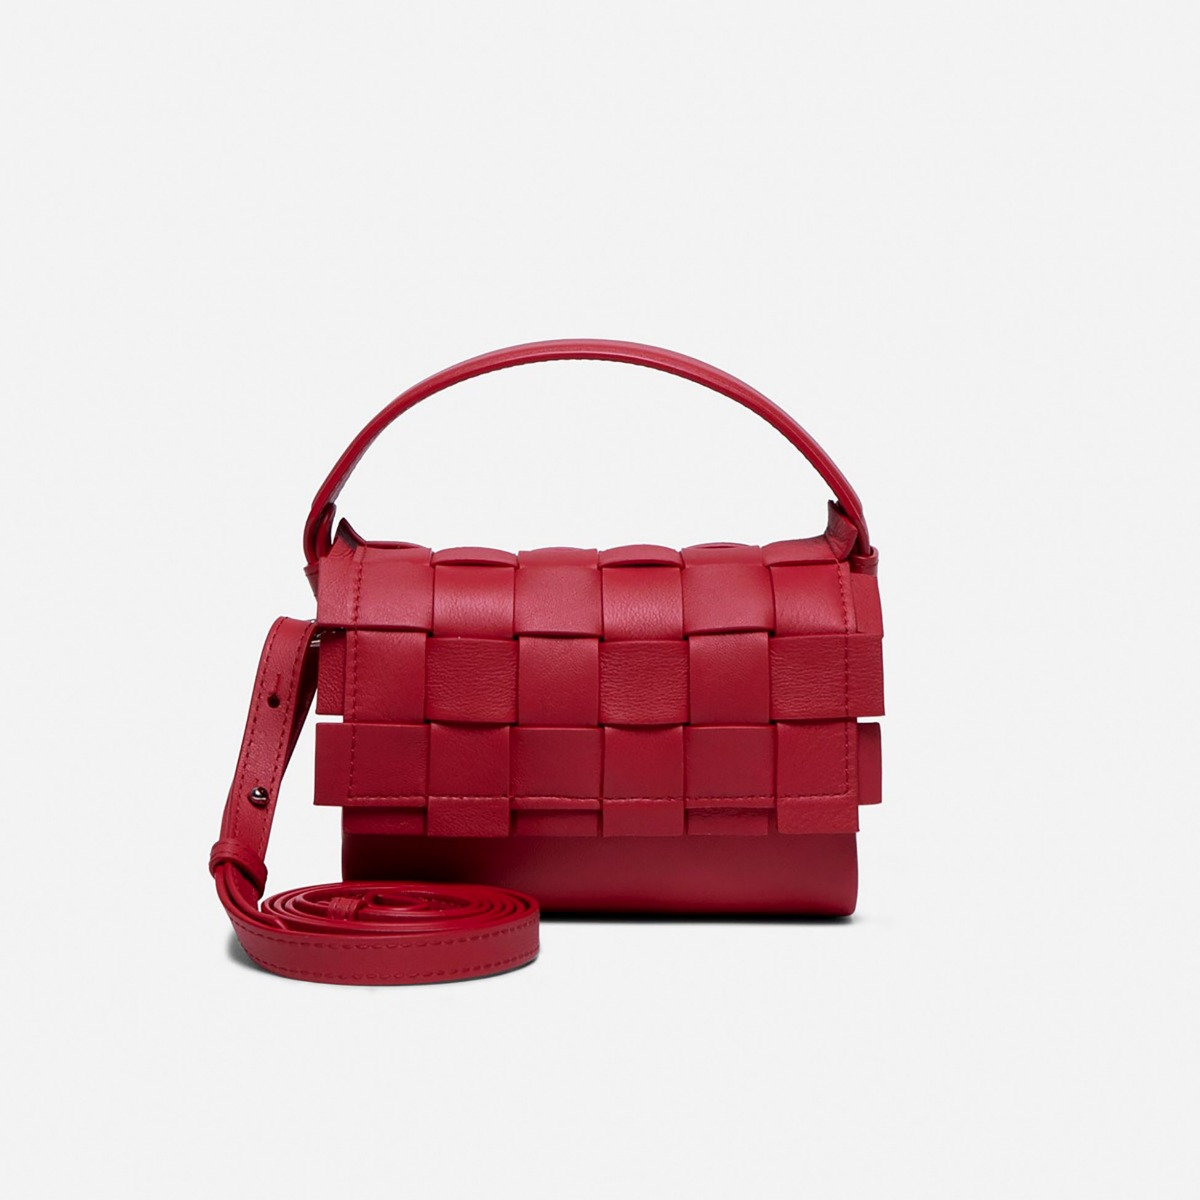 Flap Woven Handbag, small